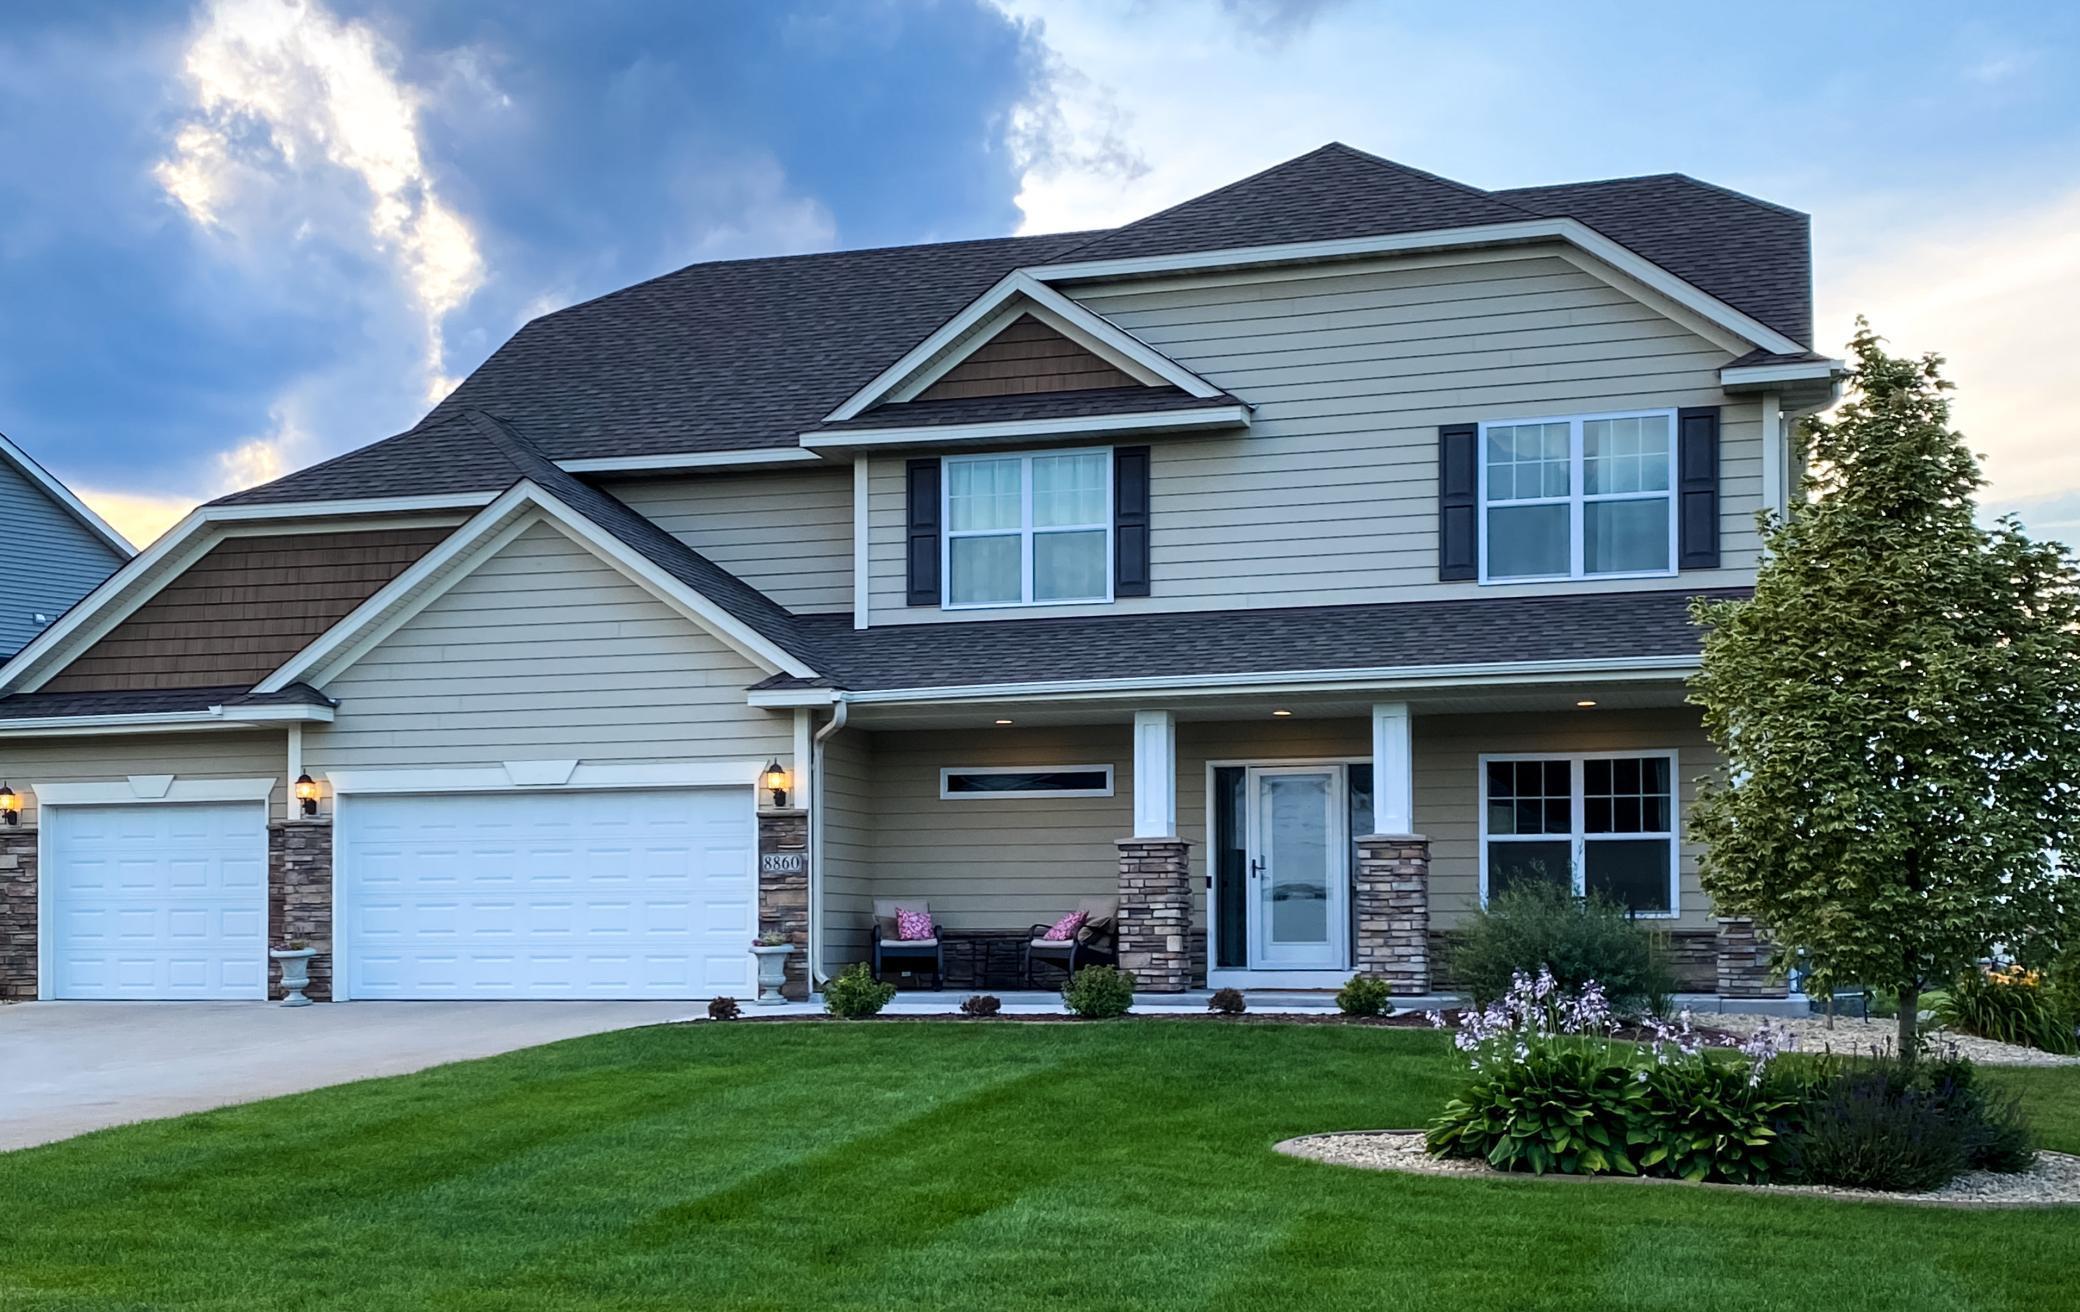 8860 Kahl NE Property Photo - Otsego, MN real estate listing